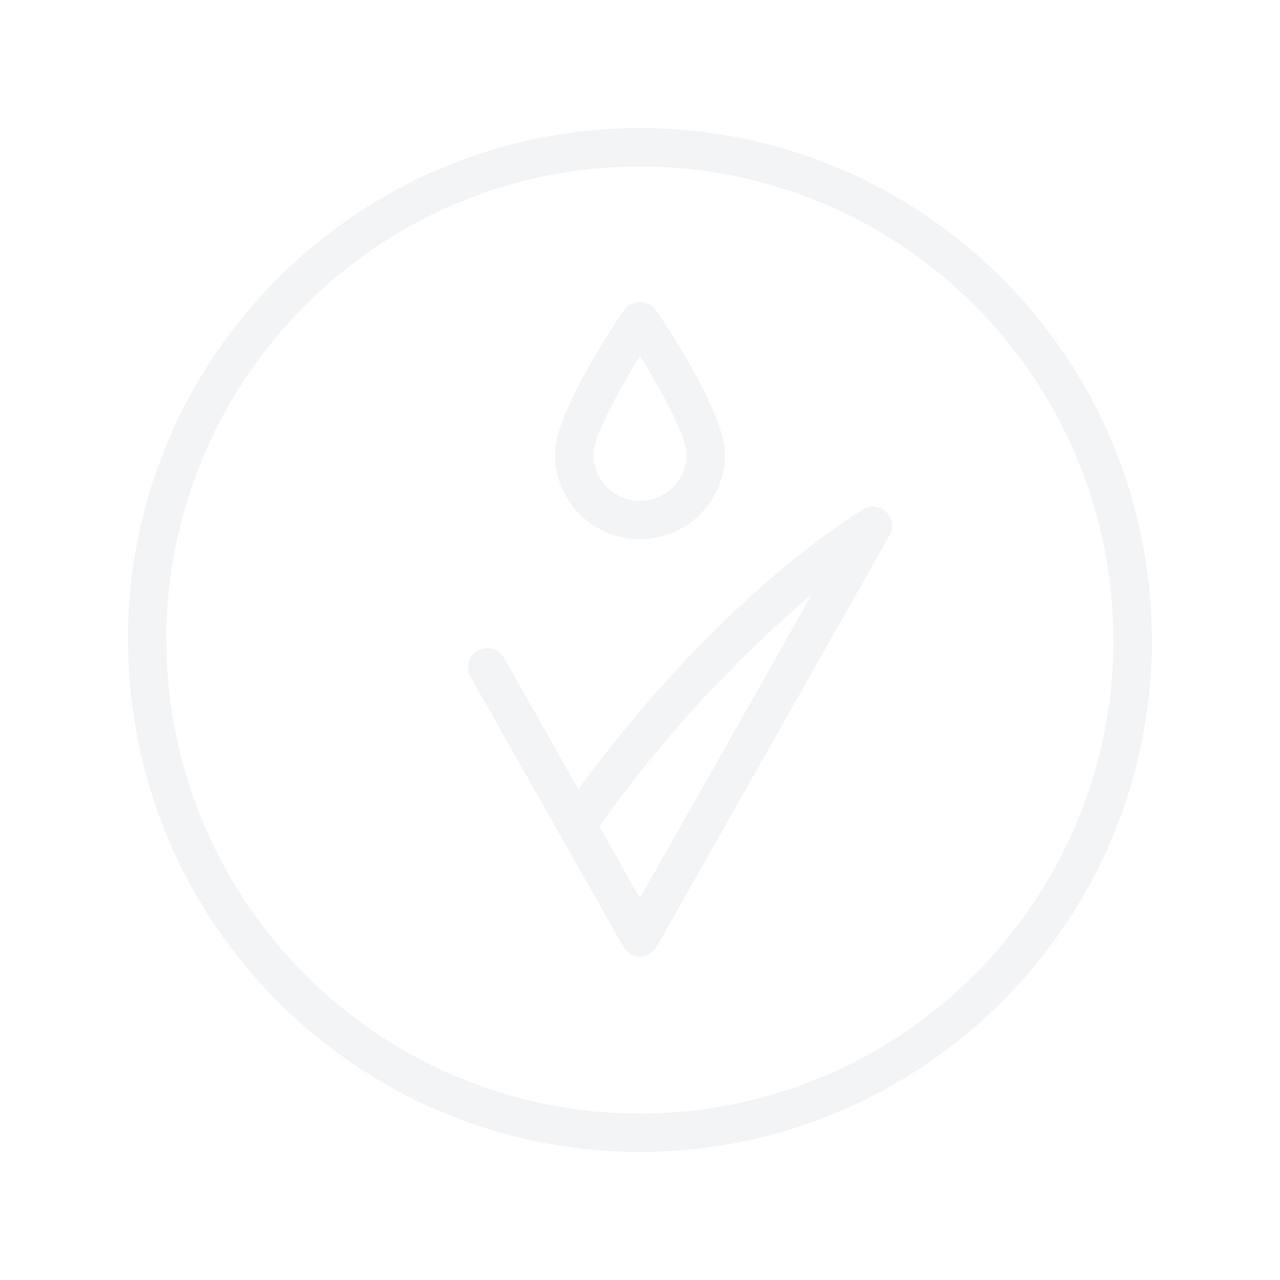 BOURJOIS Magic Hands & Feet Nail Polish Remover 75ml